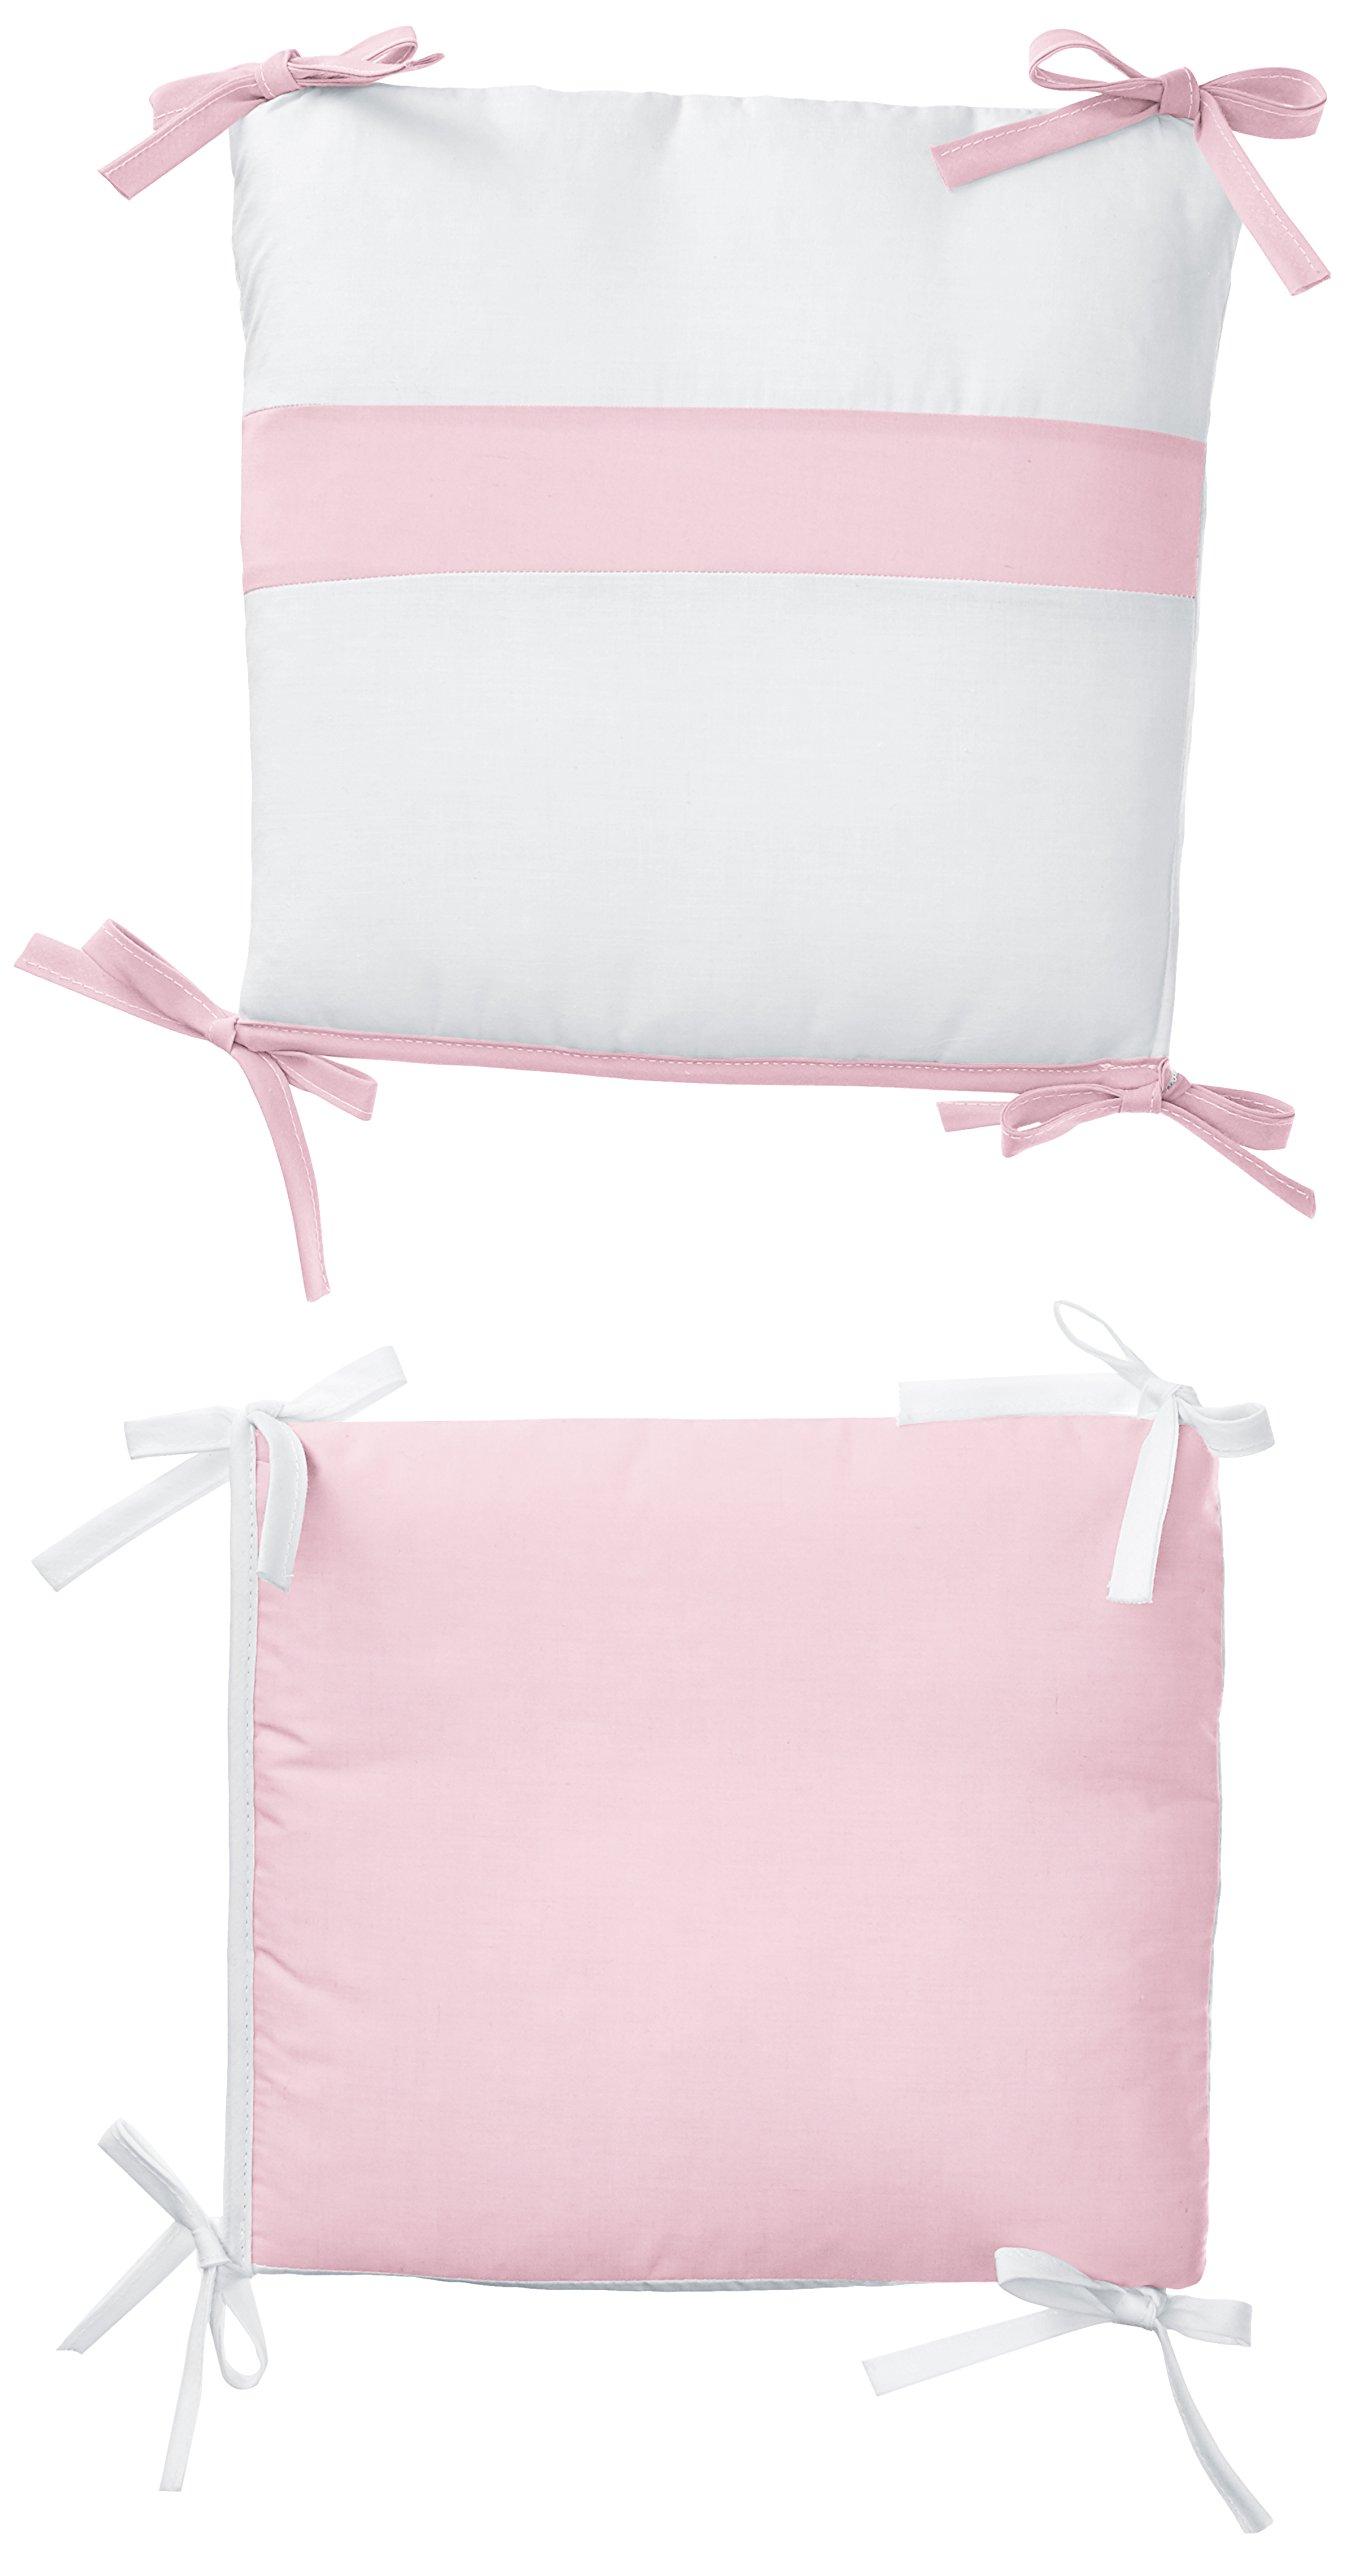 Baby Doll Bedding Junior Rocking Chair Cushion Pad Set for Child/Toddler Rocker, Pink